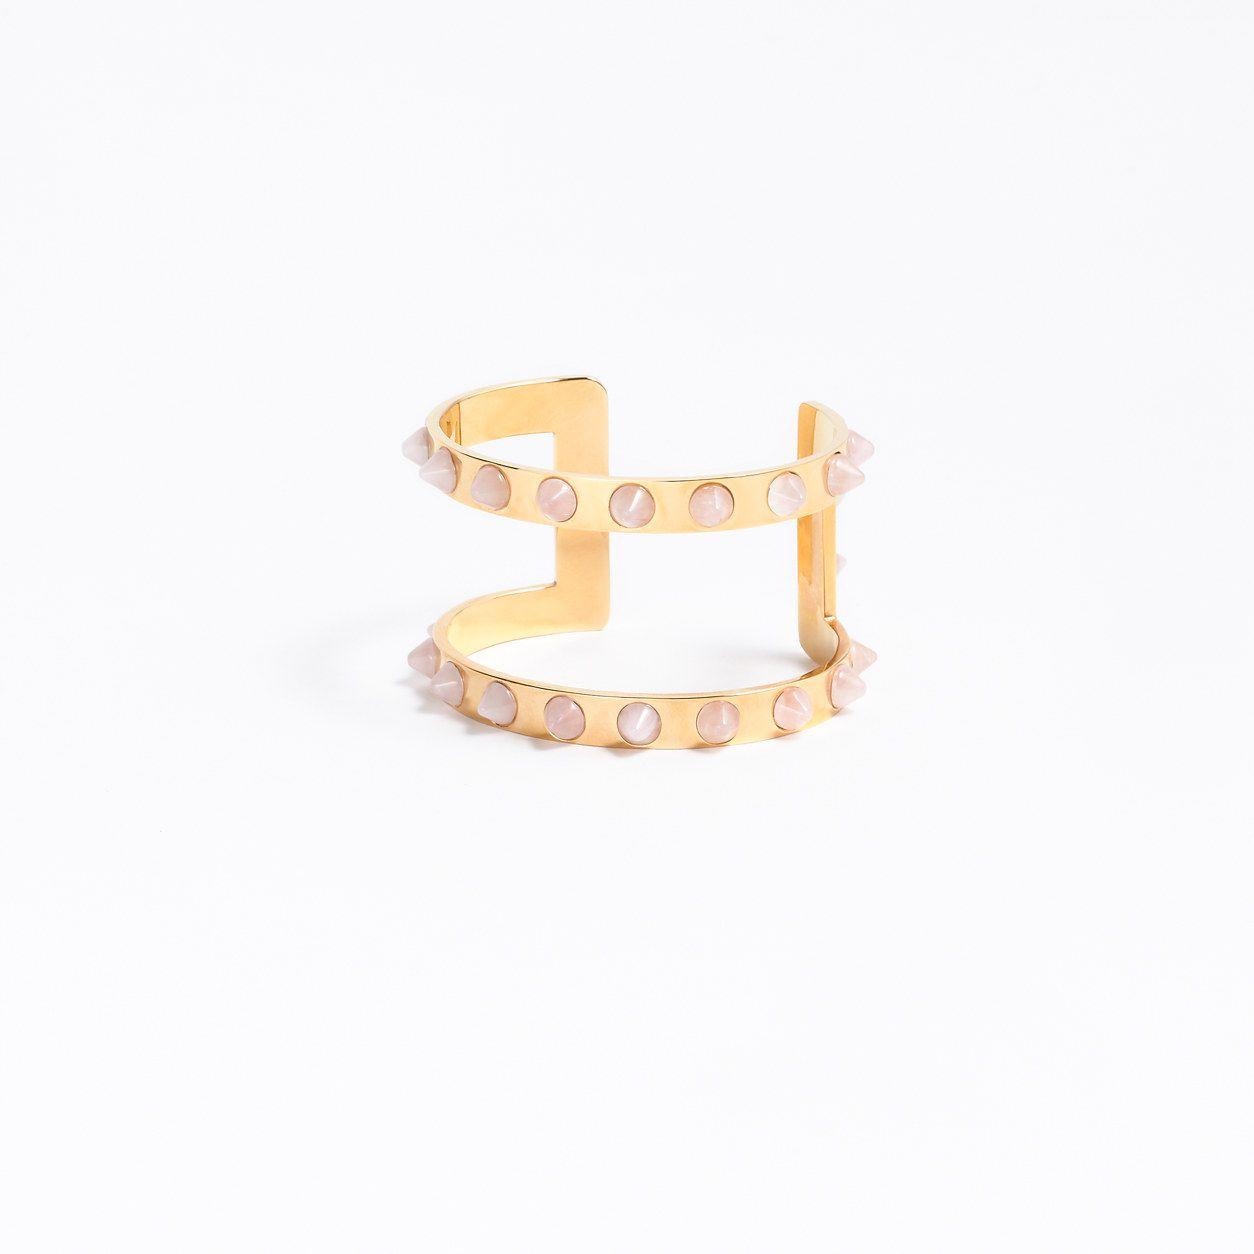 Contoured spike cuff : Jewelry Shop | J.Crew